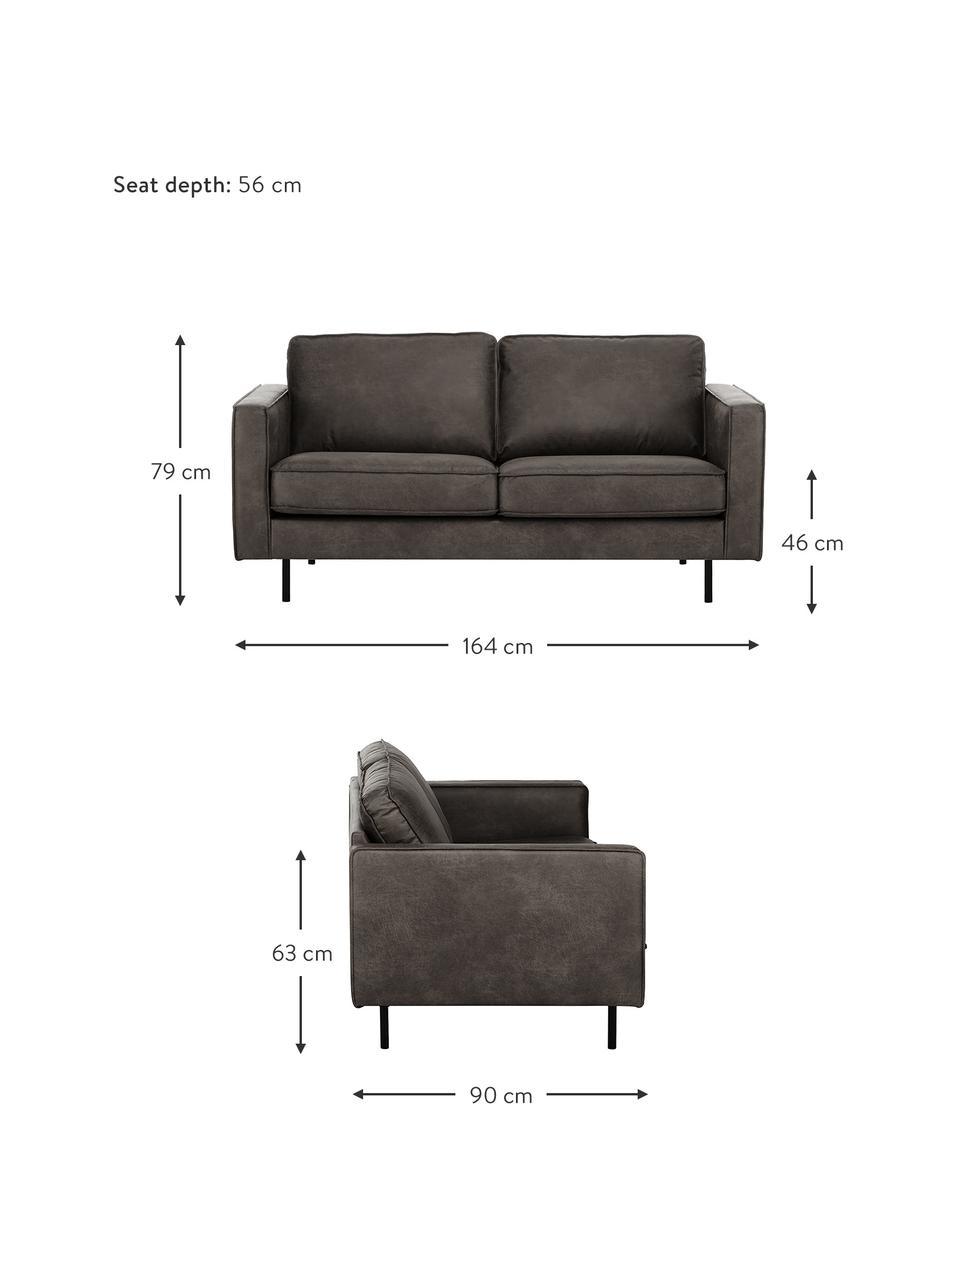 Sofa Hunter (2-Sitzer) in Braungrau aus recyceltem Leder, Bezug: Recyceltes Leder (70% Led, Gestell: Massives Birkenholz und h, Füße: Metall, pulverbeschichtet, Leder Braungrau, B 164 cm x T 90 cm